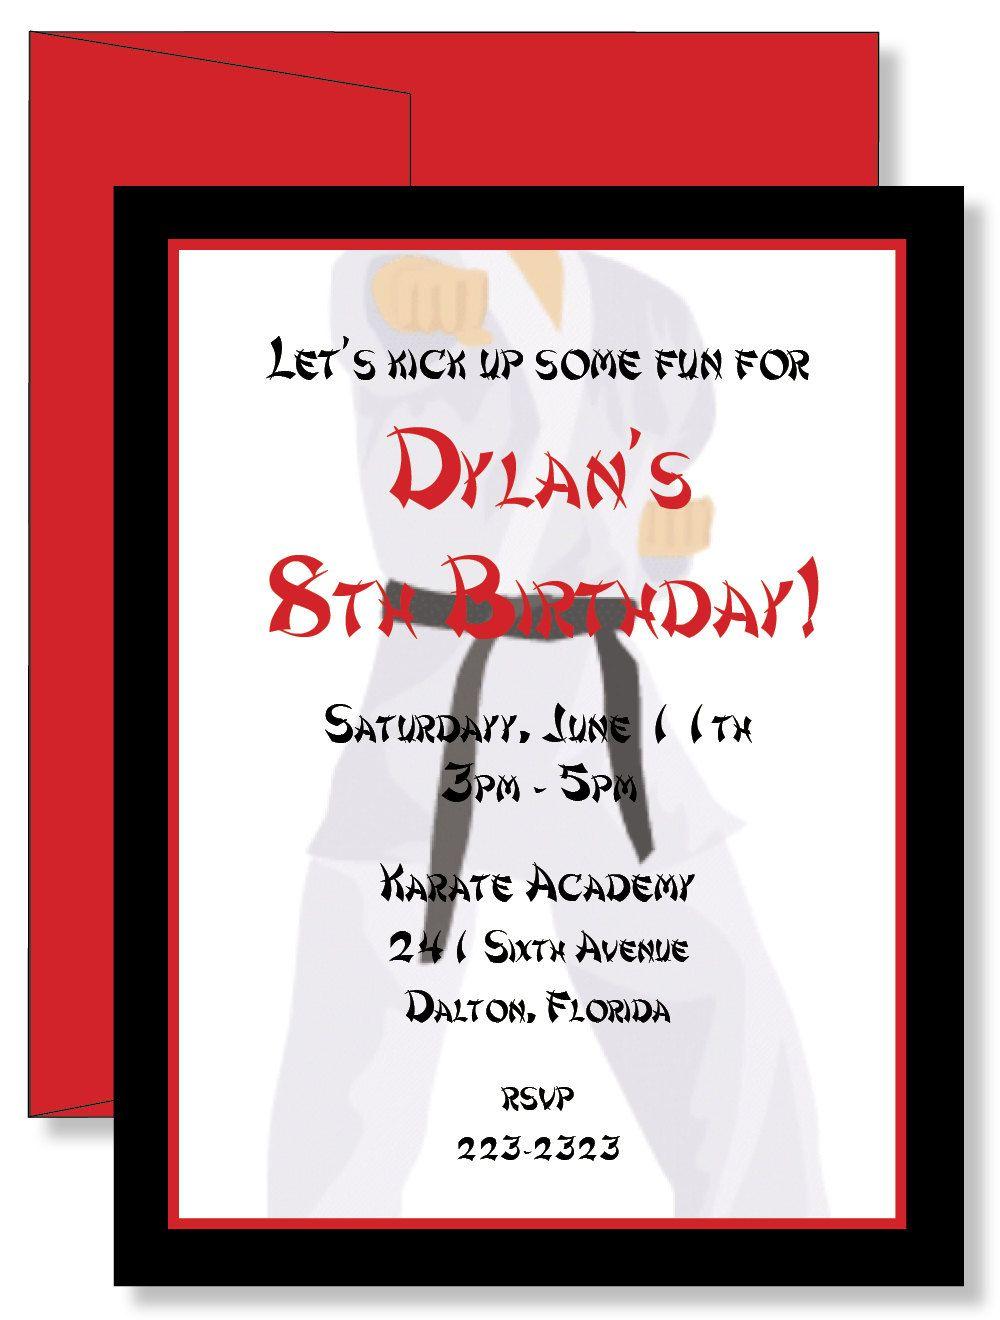 12 Custom Personalized Karate Birthday Party Invitations. $11.00 ...